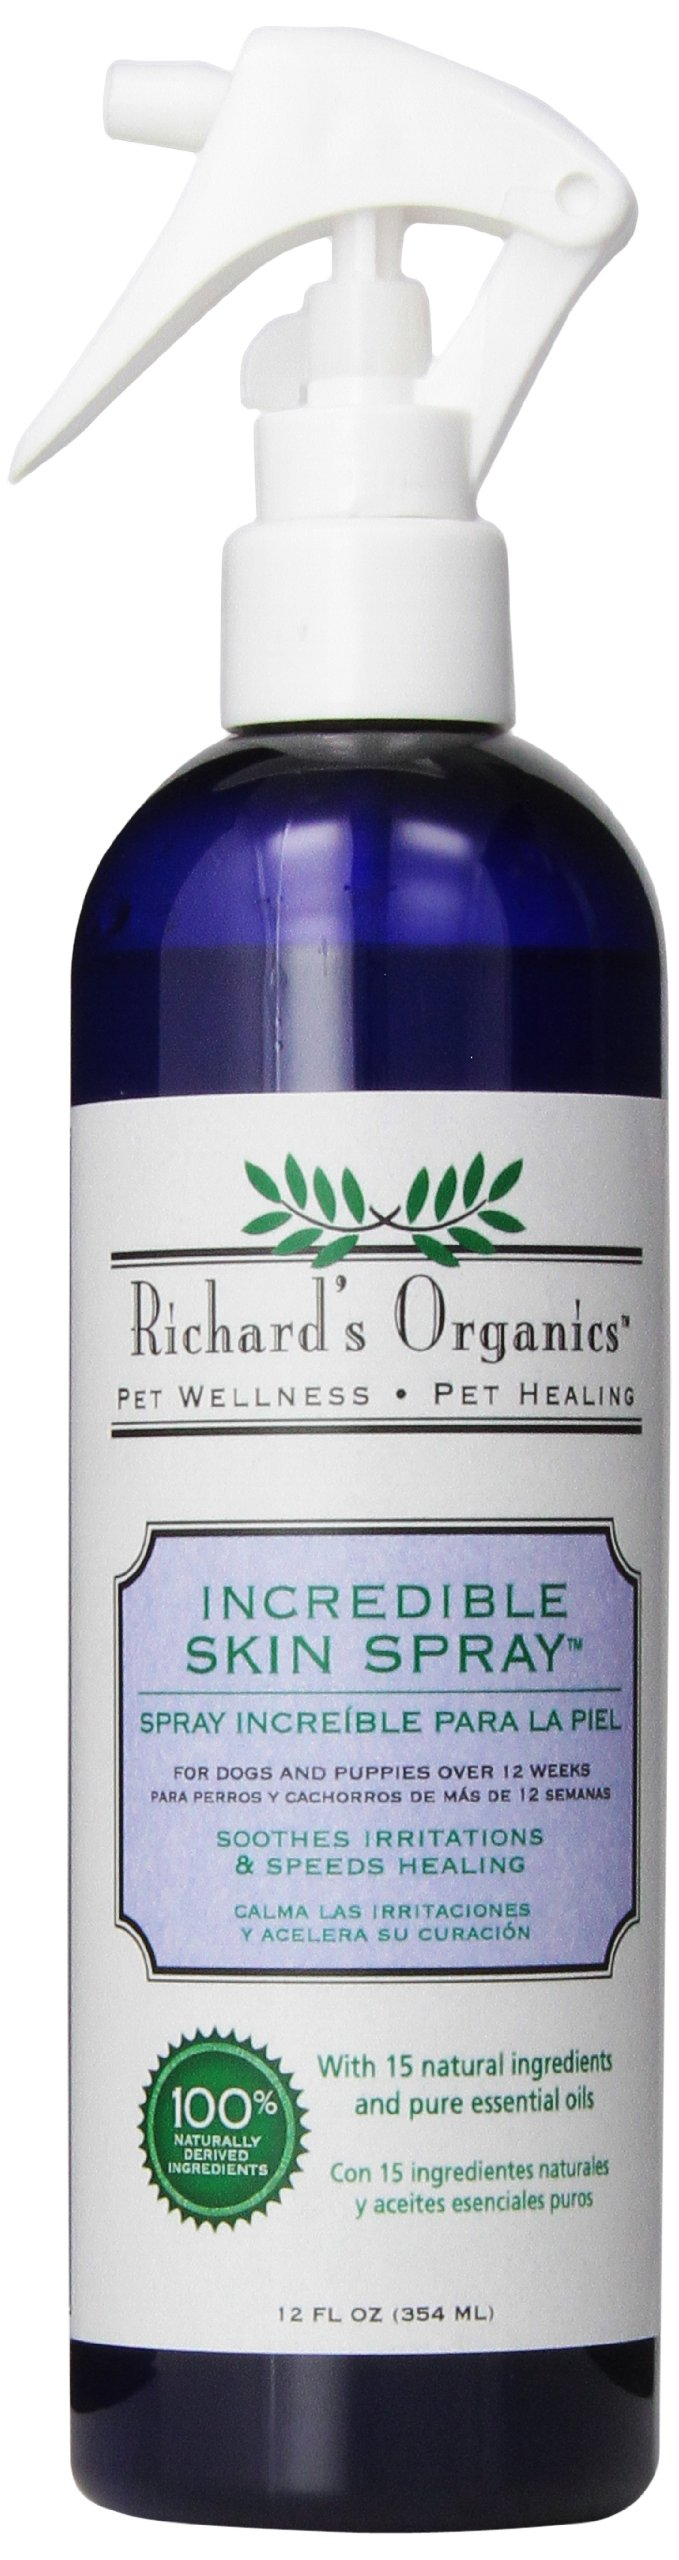 SynergyLabs Richard's Organics Incredible Skin Spray for Dogs; 12 fl. oz.